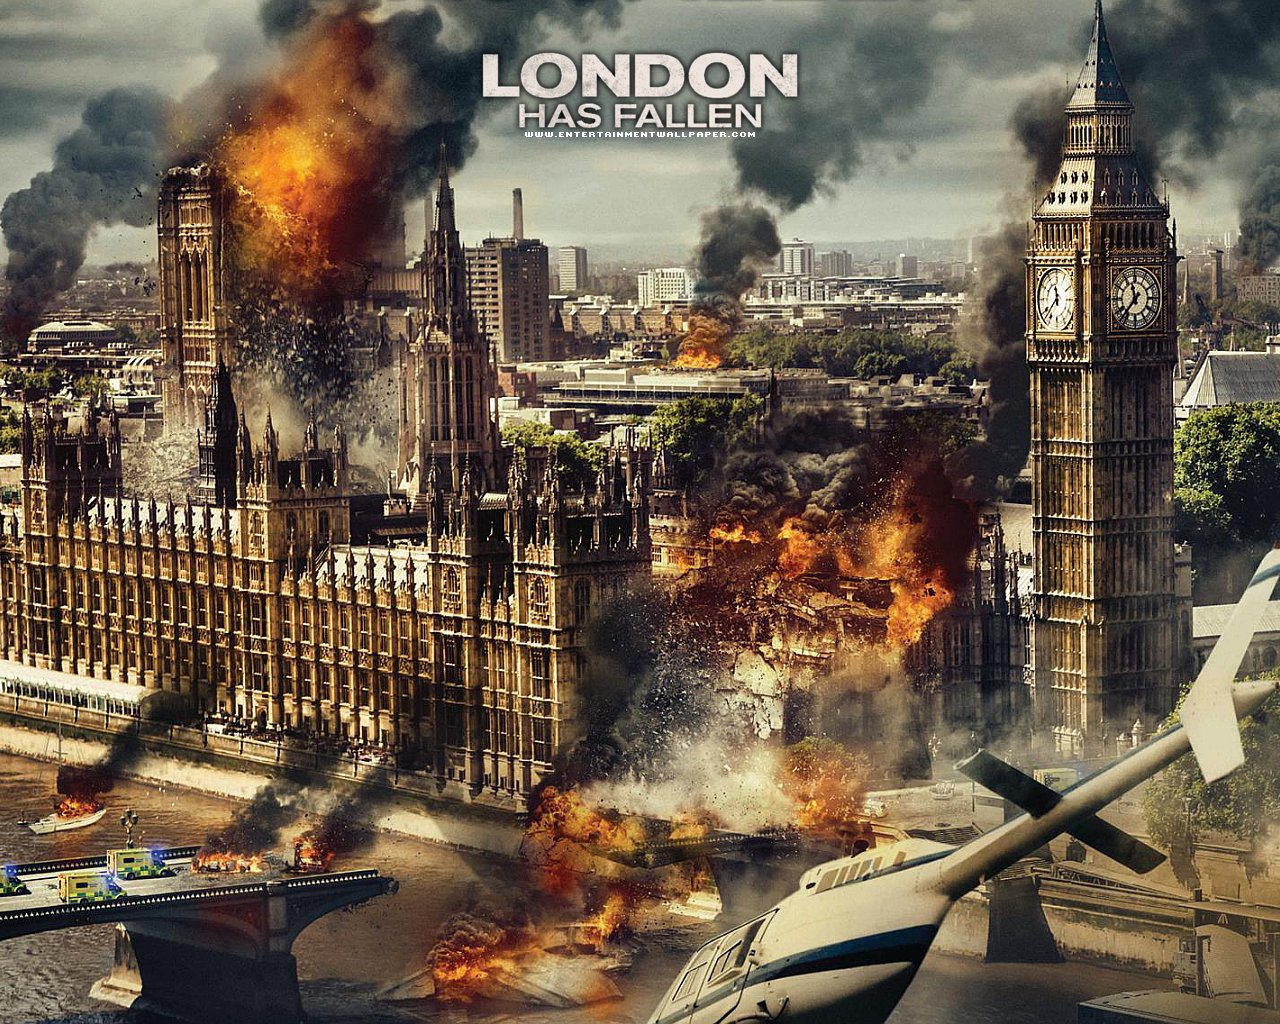 london has fallen wallpaper 10046115 size 1280x1024 more london has 1280x1024